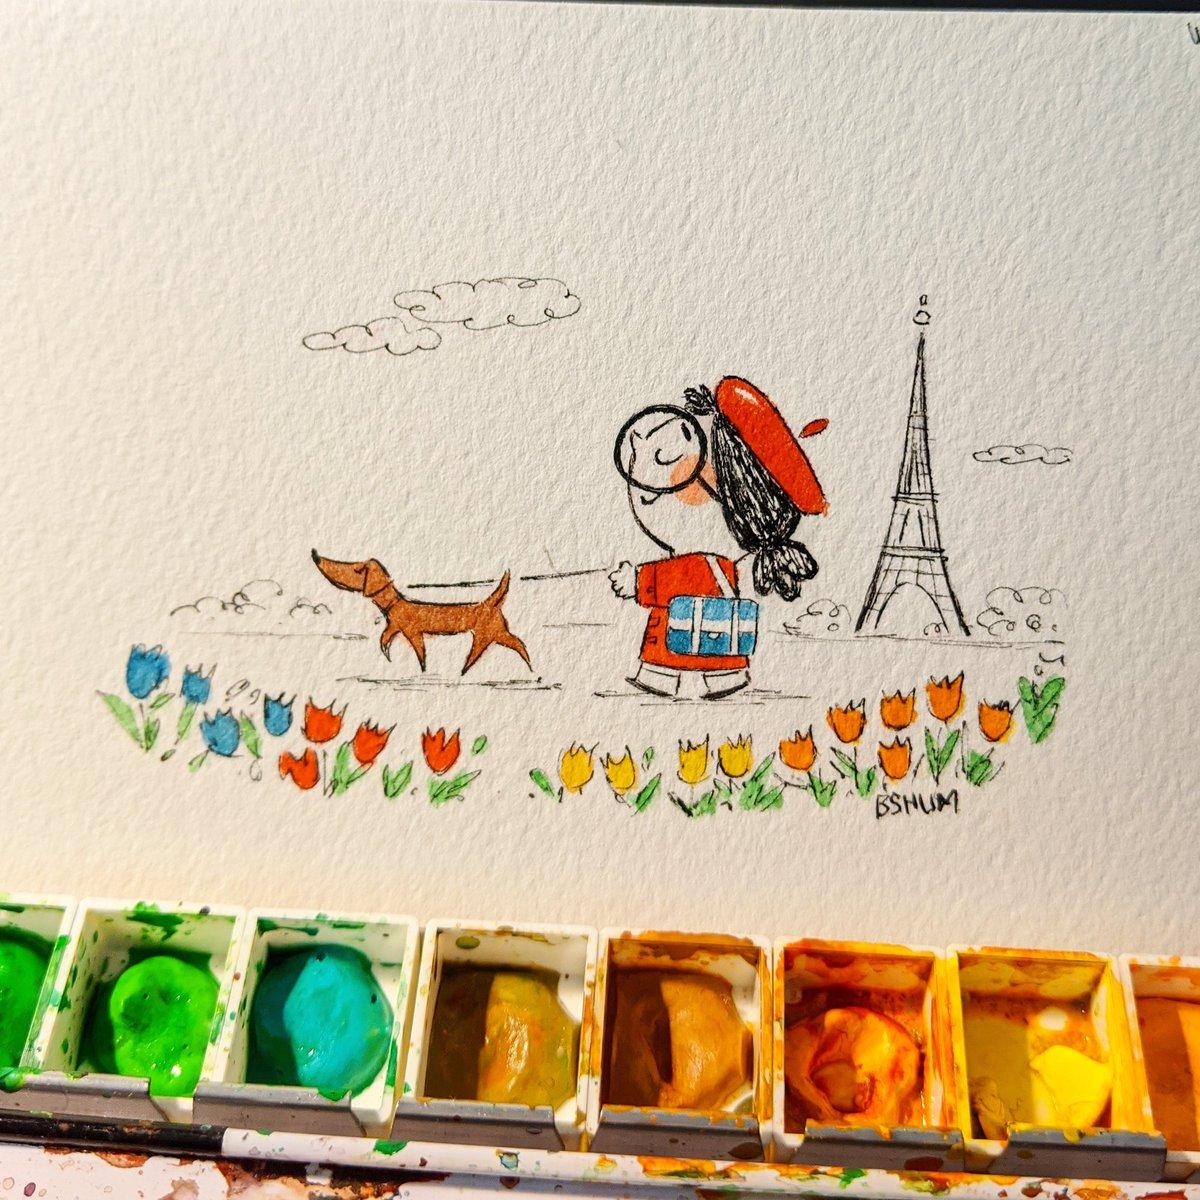 A stroll in the park. #Paris #kidlitart #illustrationpic.twitter.com/KckI04Or1Y